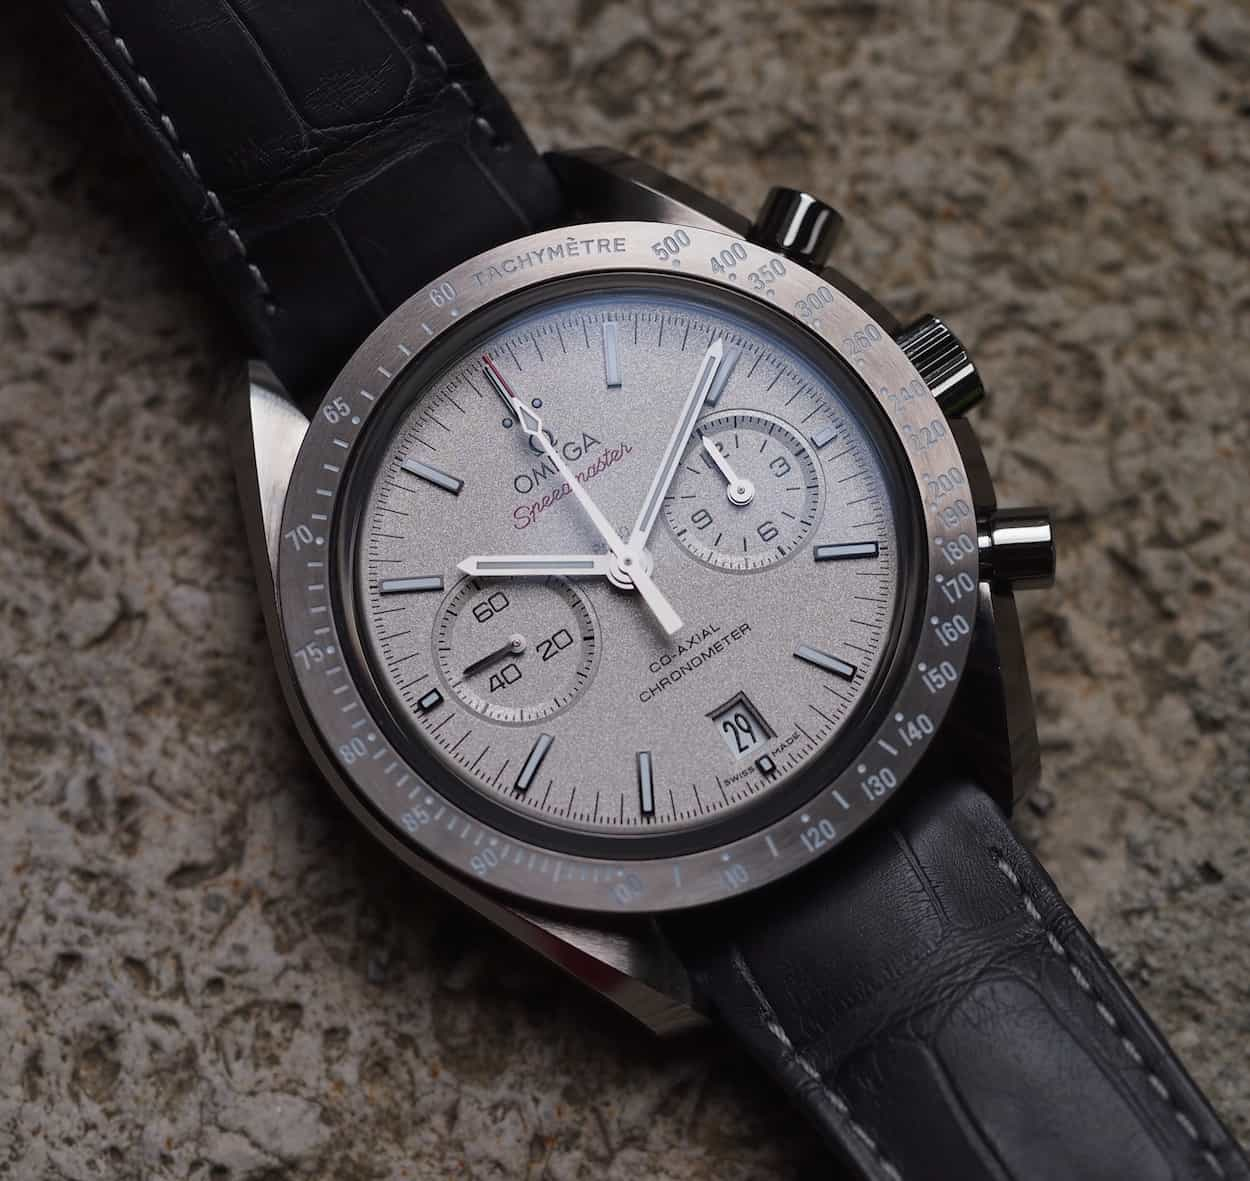 Omega GSotM certified chronometer